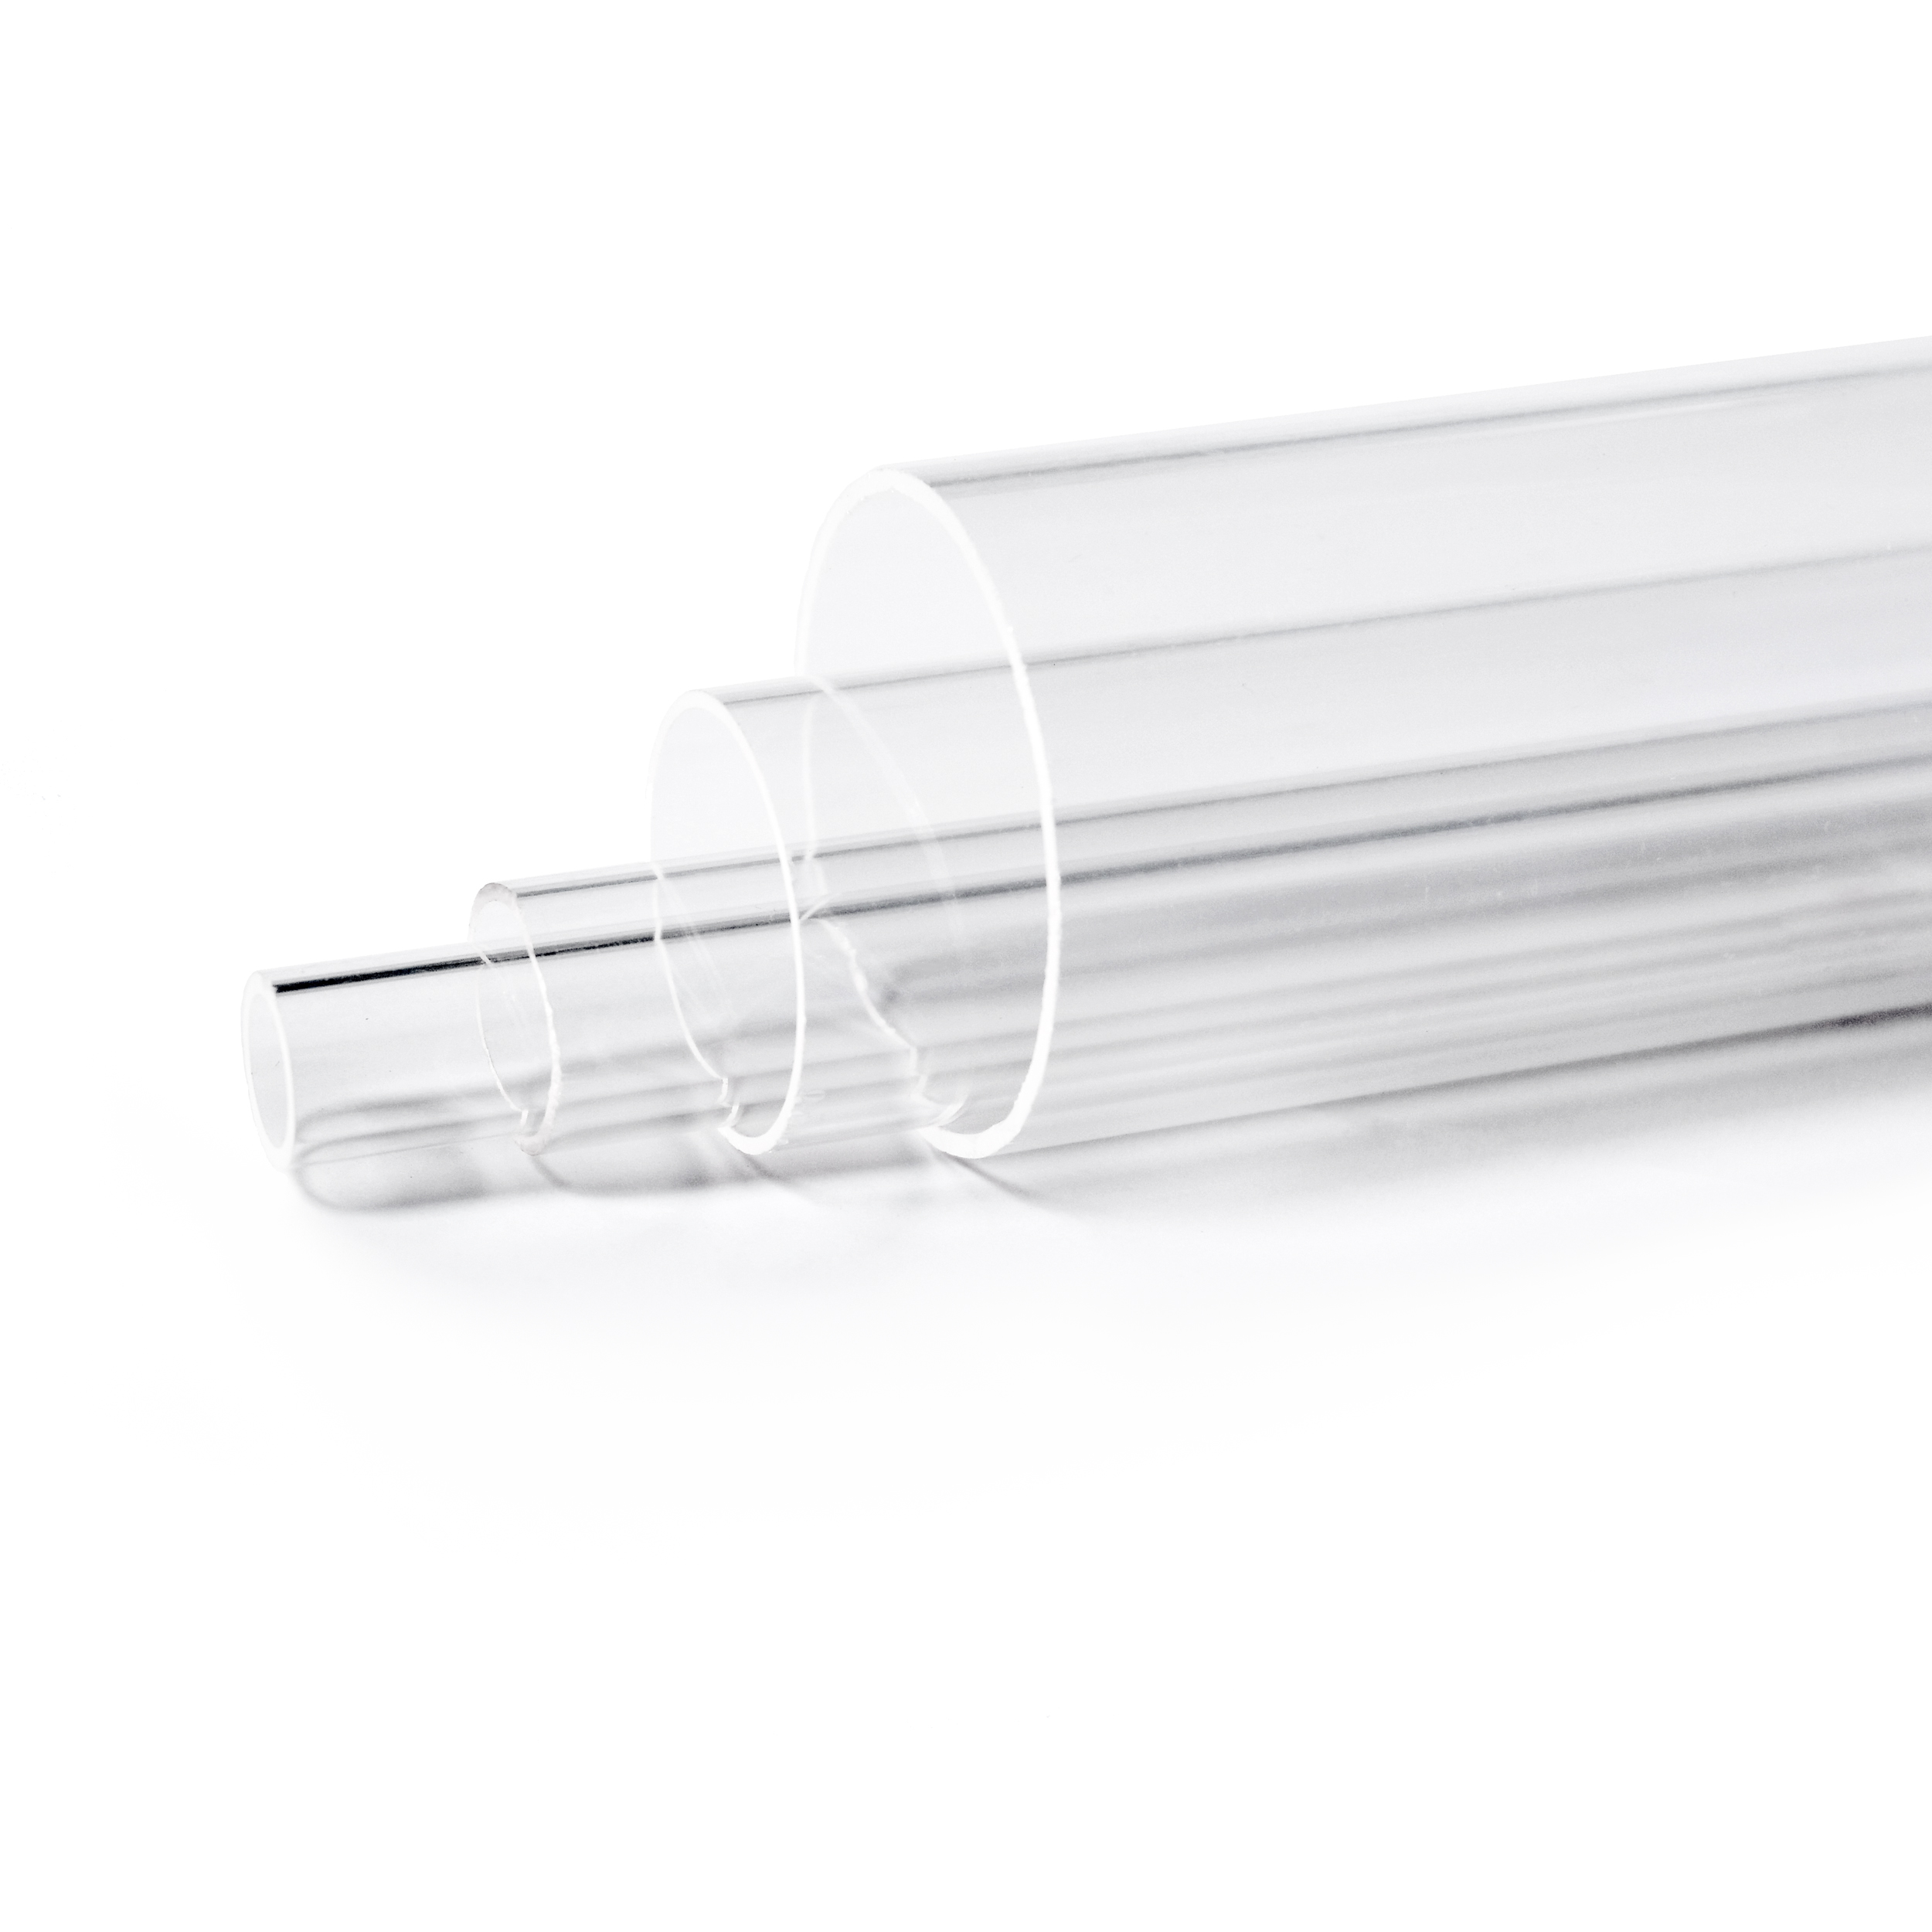 Quartz Glass Tubes